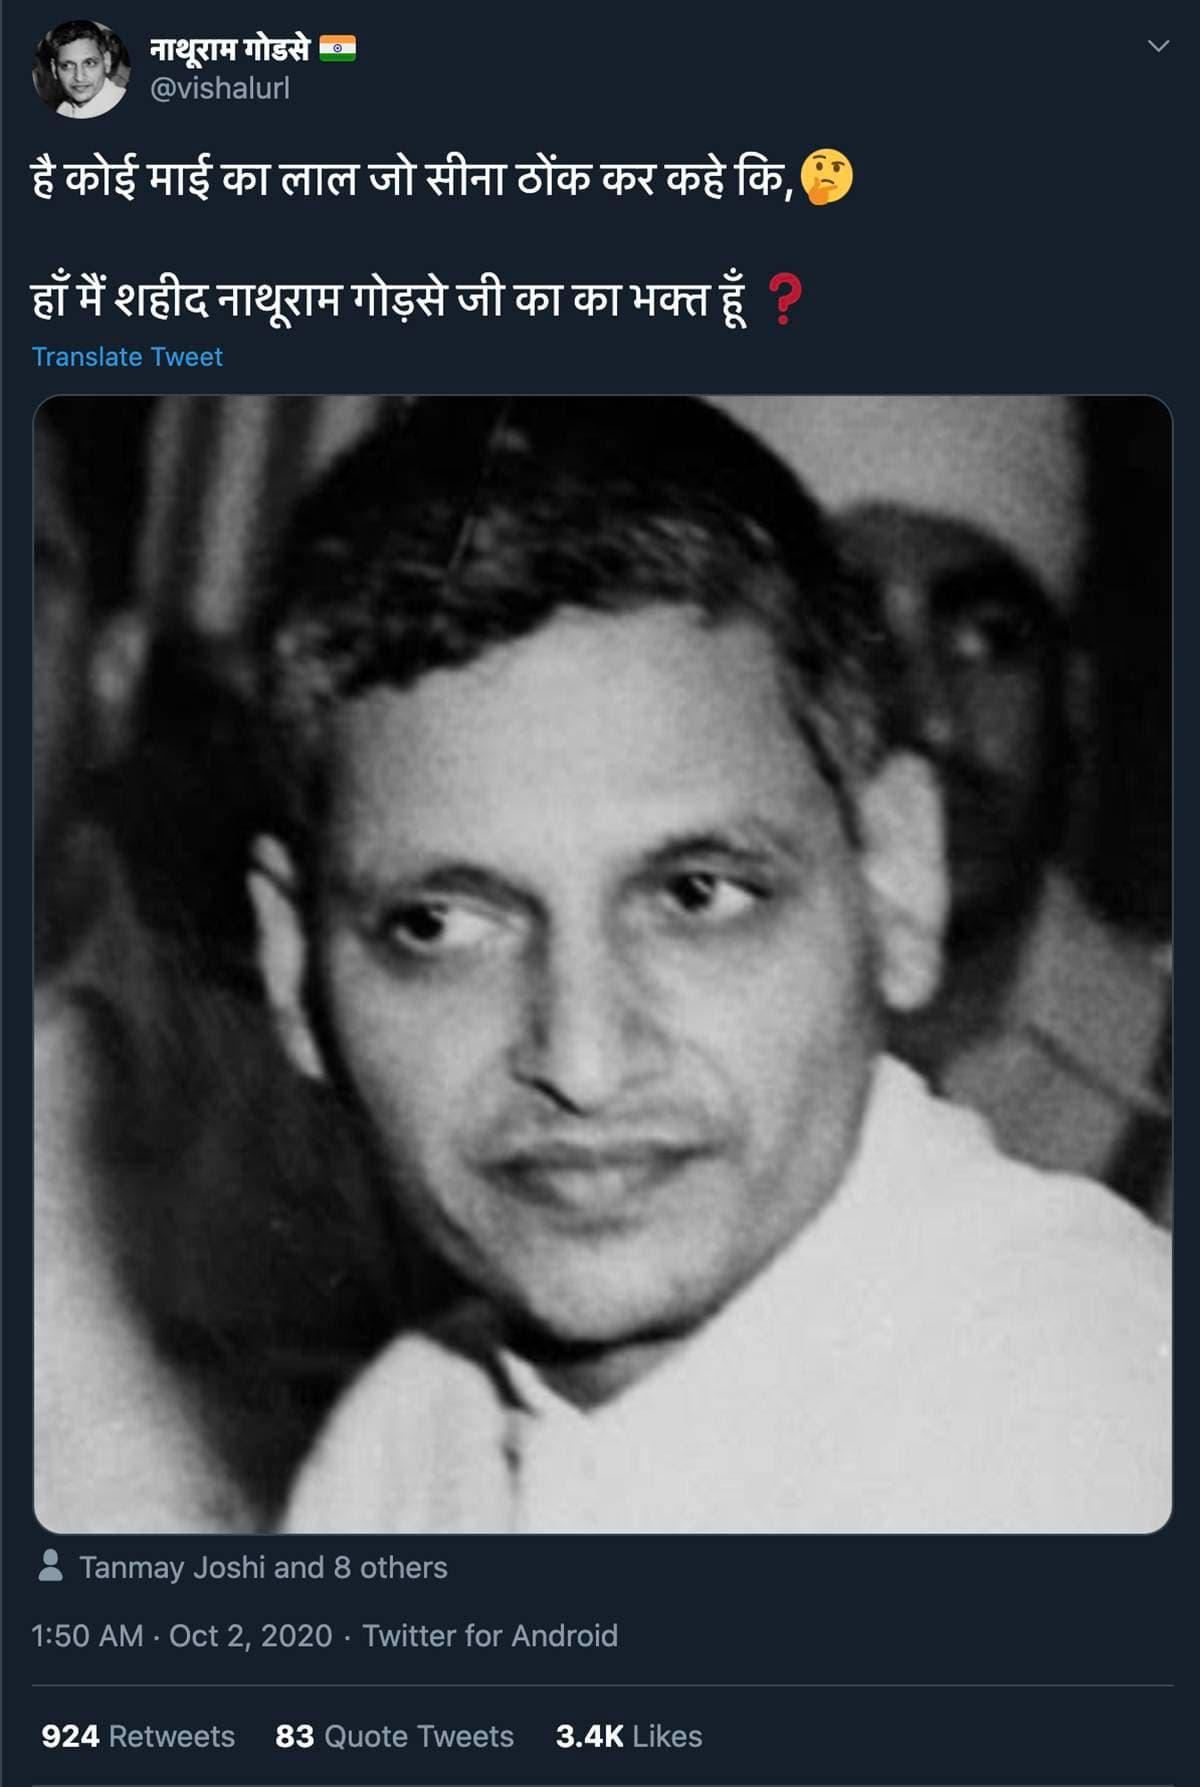 Mahatma Gandhi, Gandhi jayanti, twitter, twitter nathuram godse, twitter trend nathuram godse, how twitter trends, nathuram godse zindabad trending, indian express, express explained,